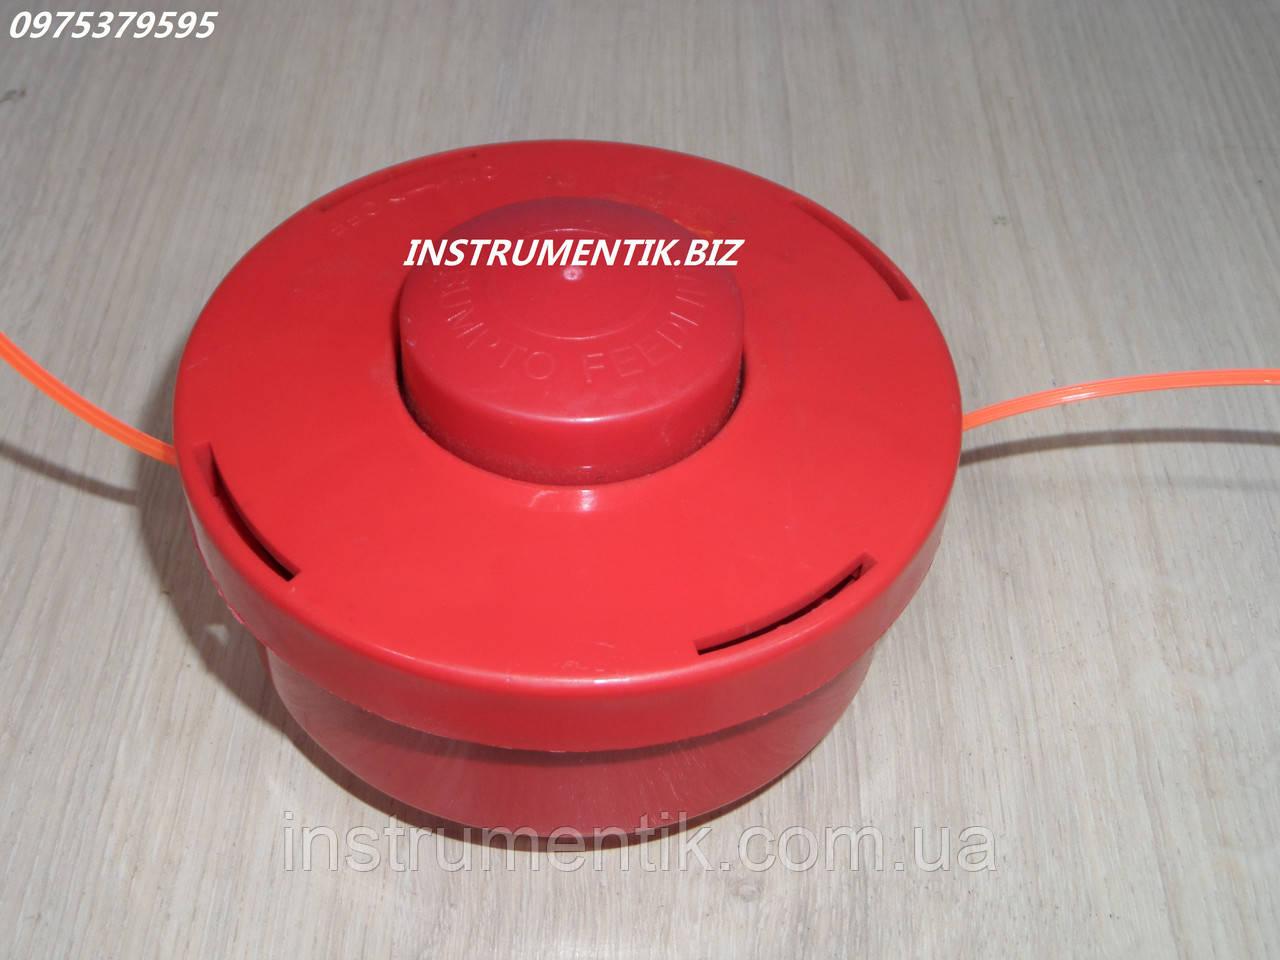 Катушка полуавтомат для мотокосы.M10*1.25